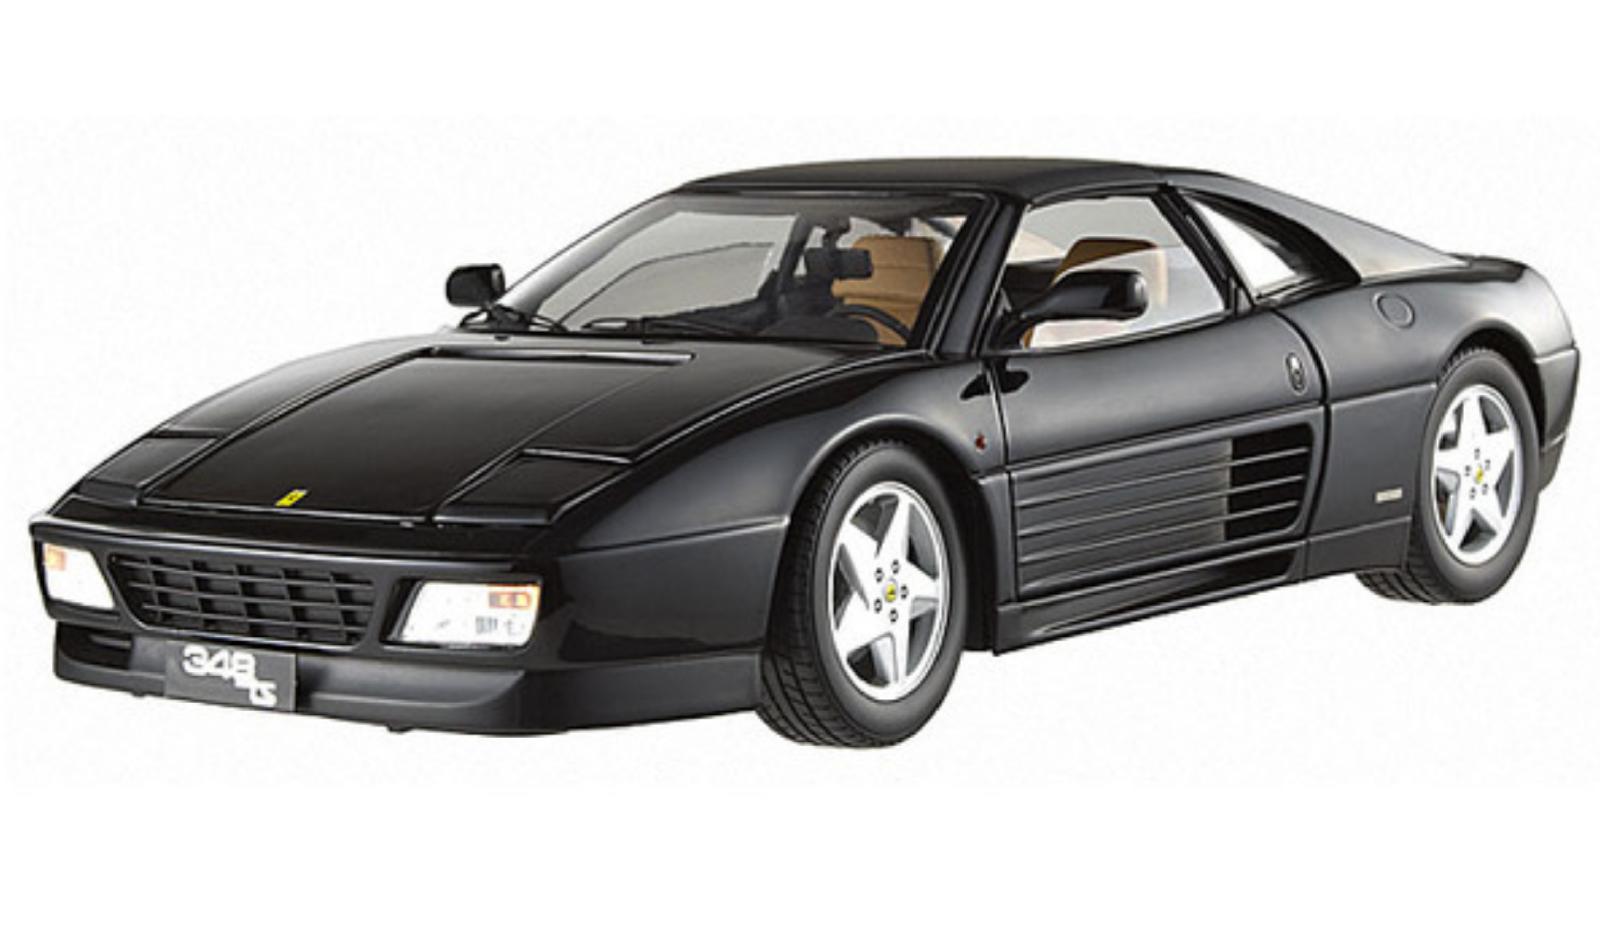 1 18 Ferrari 348 TS 1989 1 18 • Hot Wheels X5481